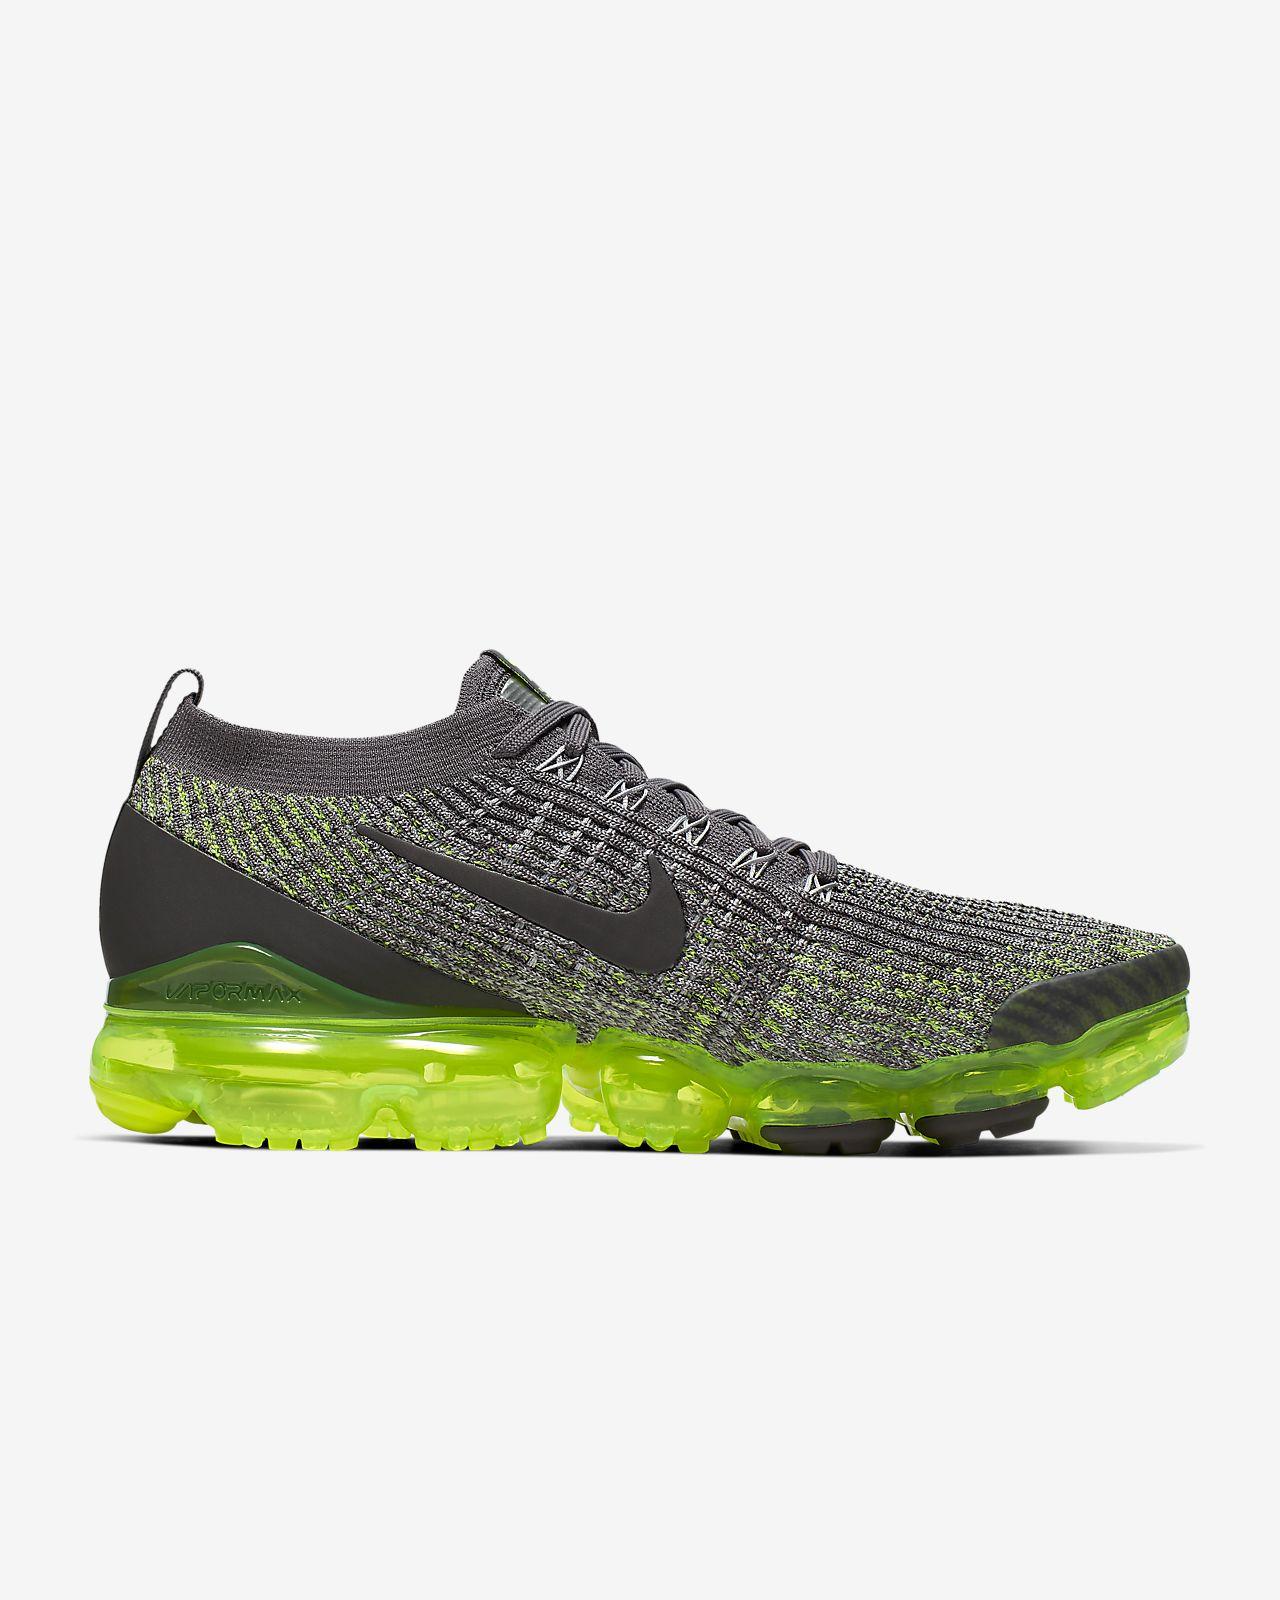 san francisco factory outlet dirt cheap Nike Air VaporMax Flyknit 3 Men's Shoe